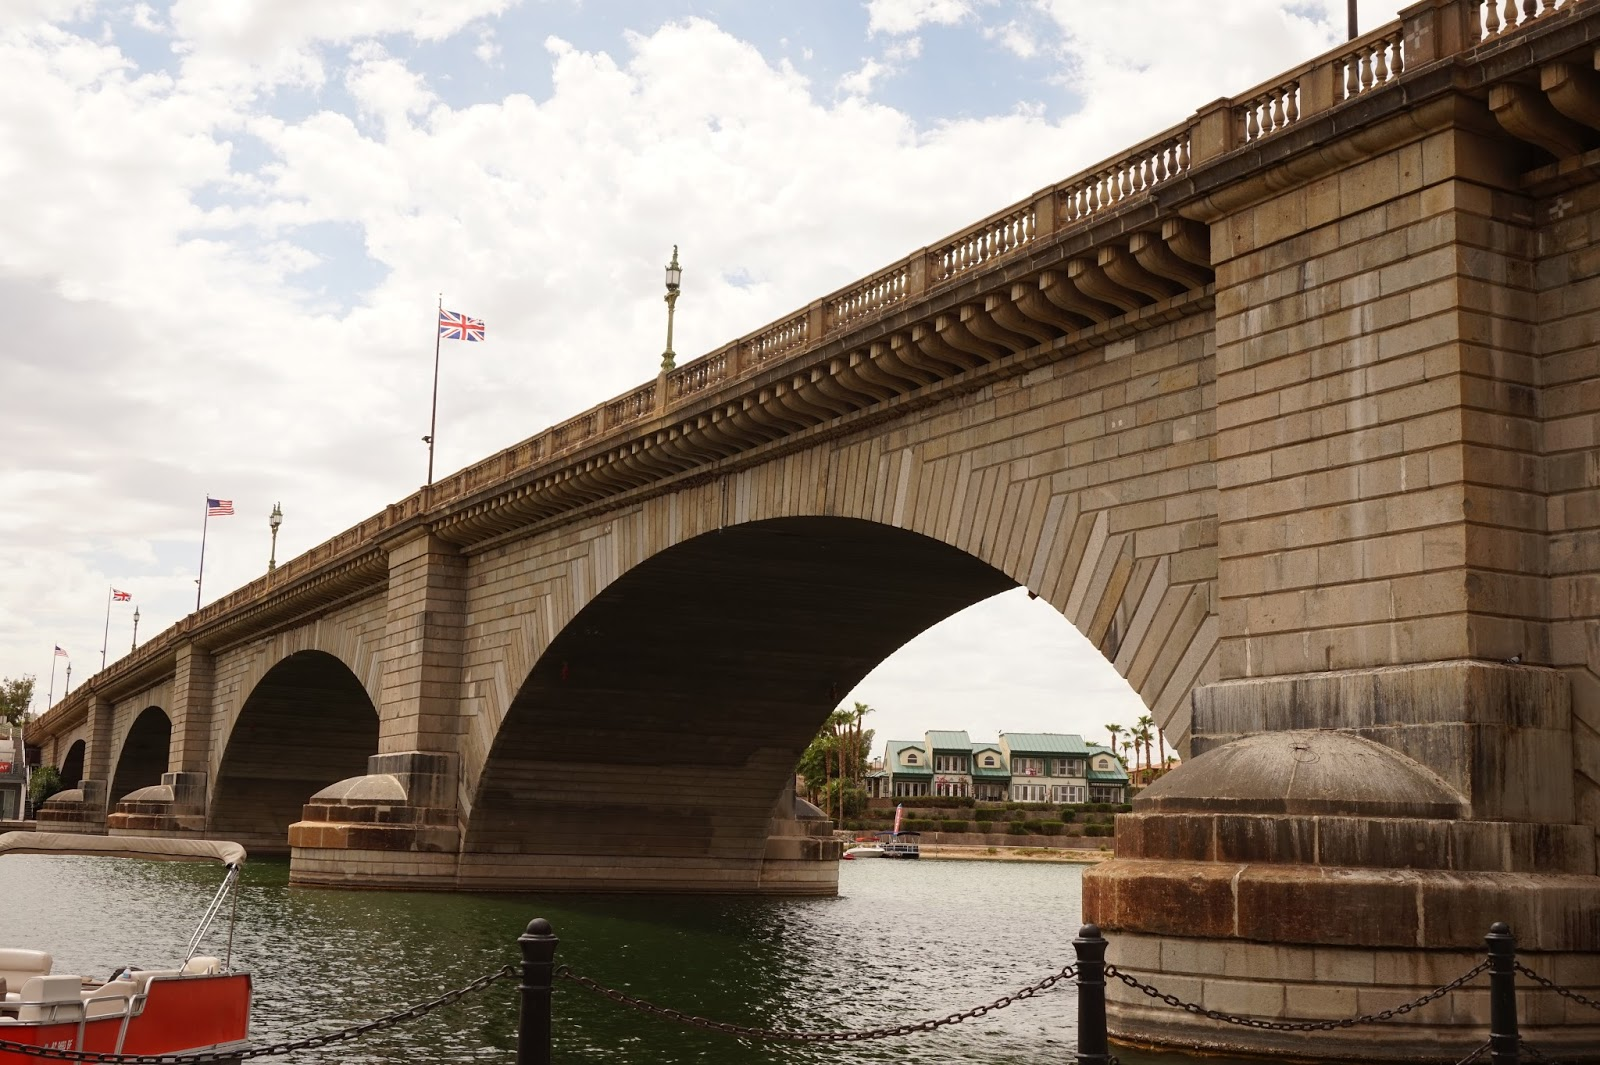 London Bridge Cost Lake Havasu City